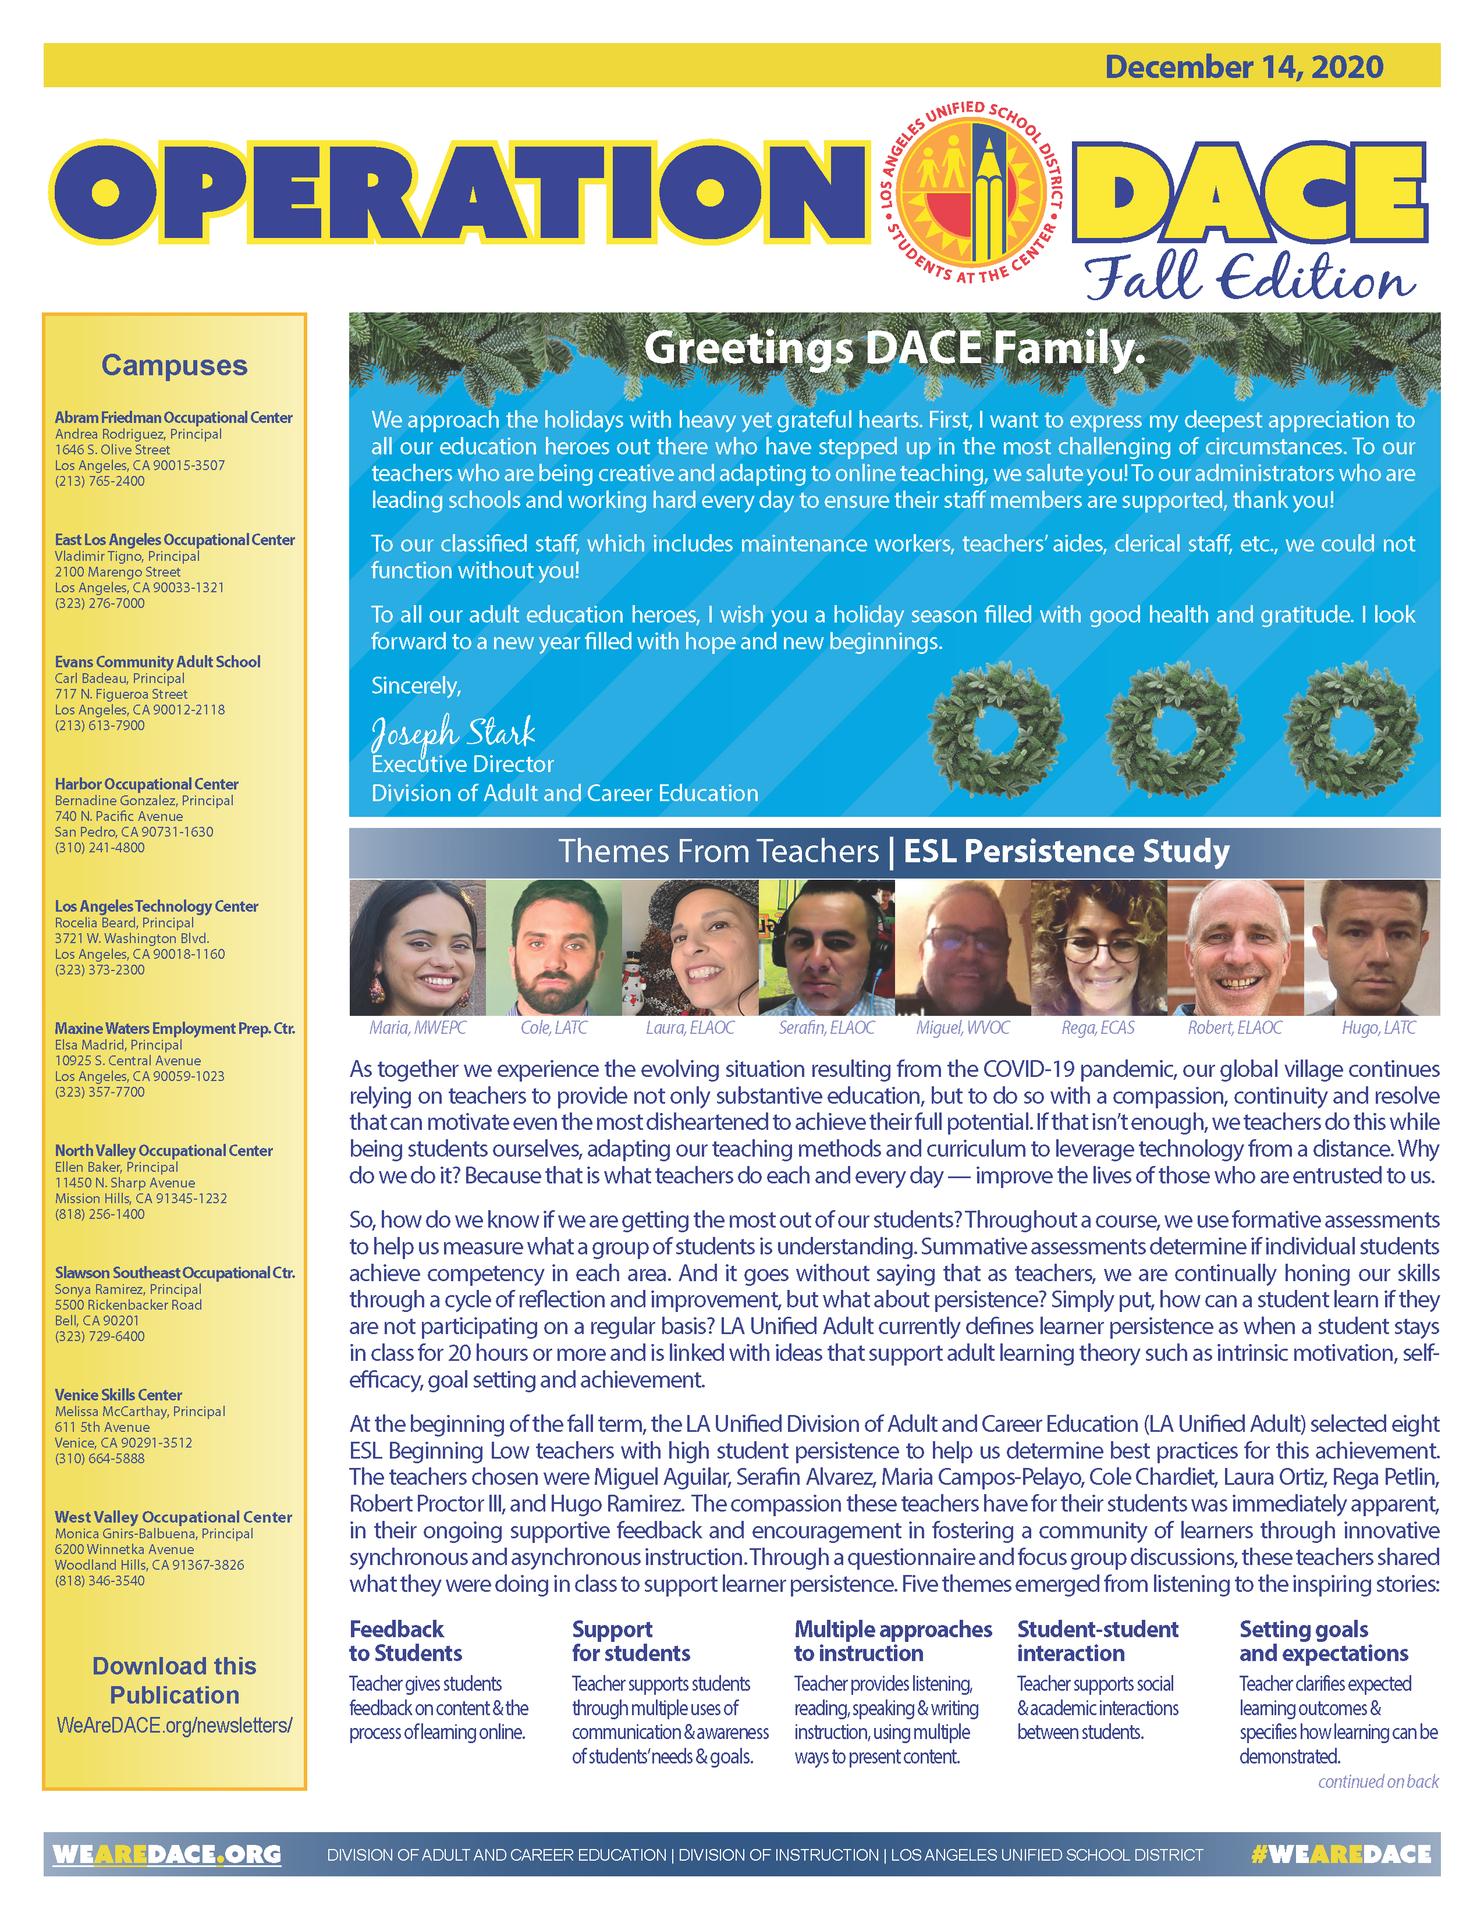 DACE Newsletter - December 14, 2020 Thumbnail